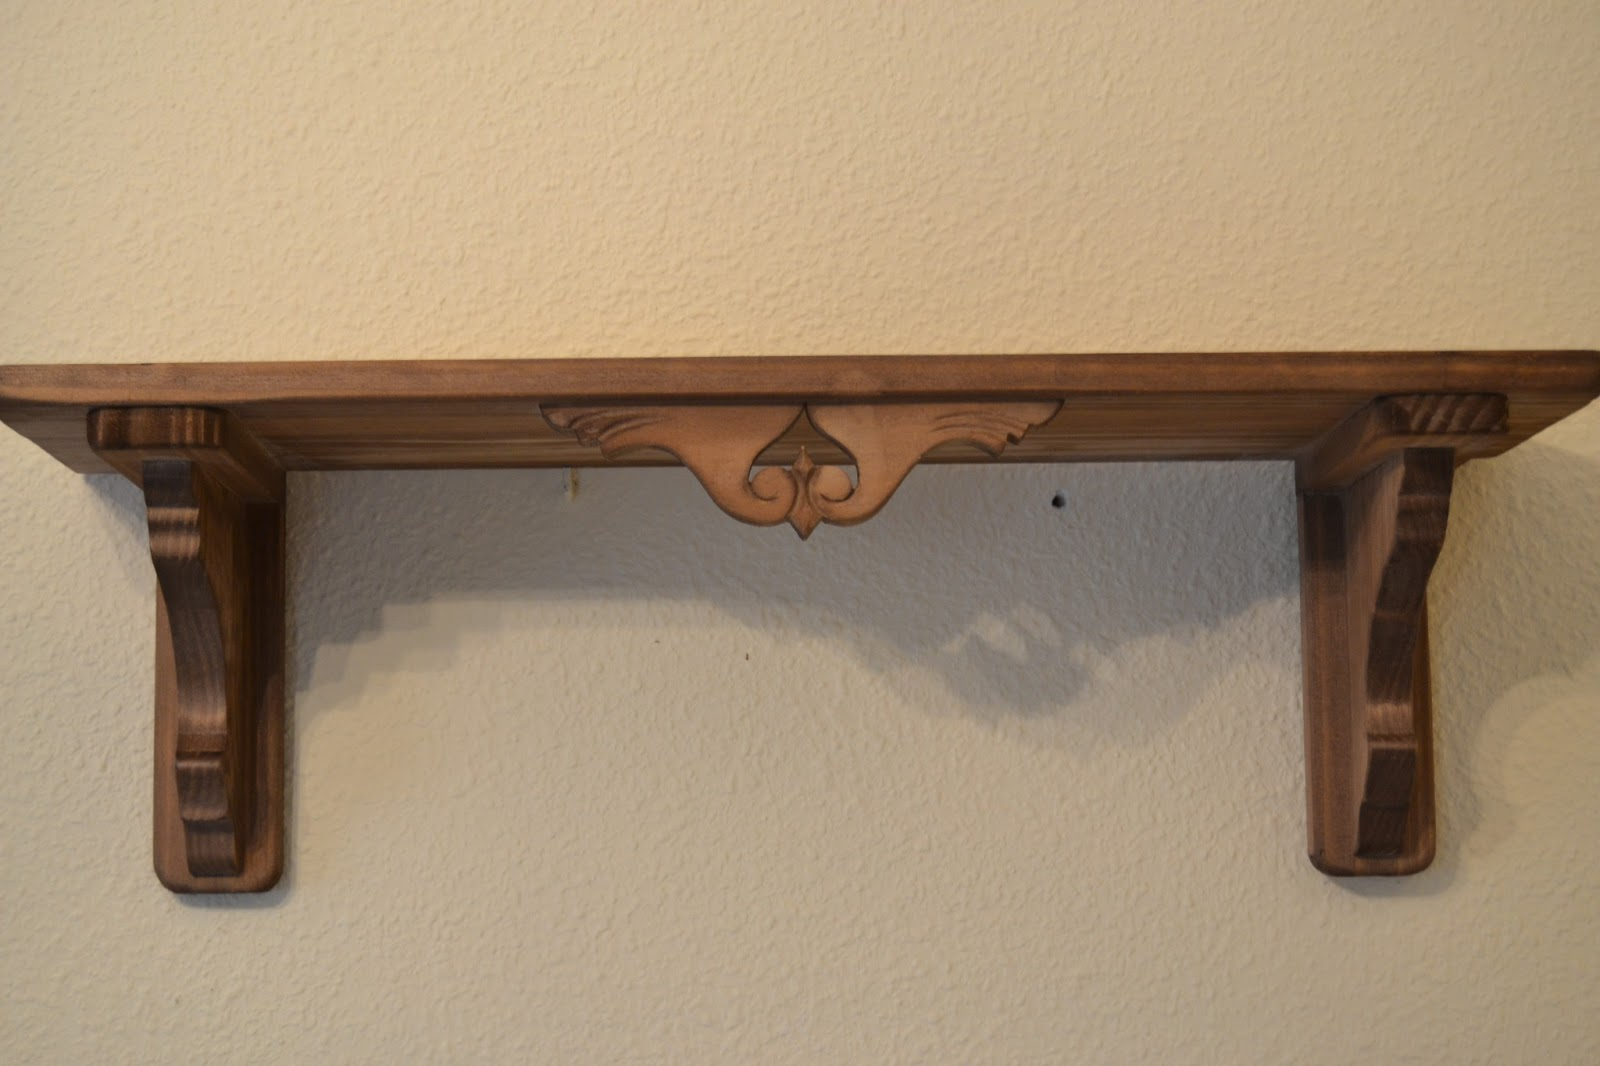 Artesan a r stica en madera balda de madera para pared tallada art 070 - Balda de madera ...